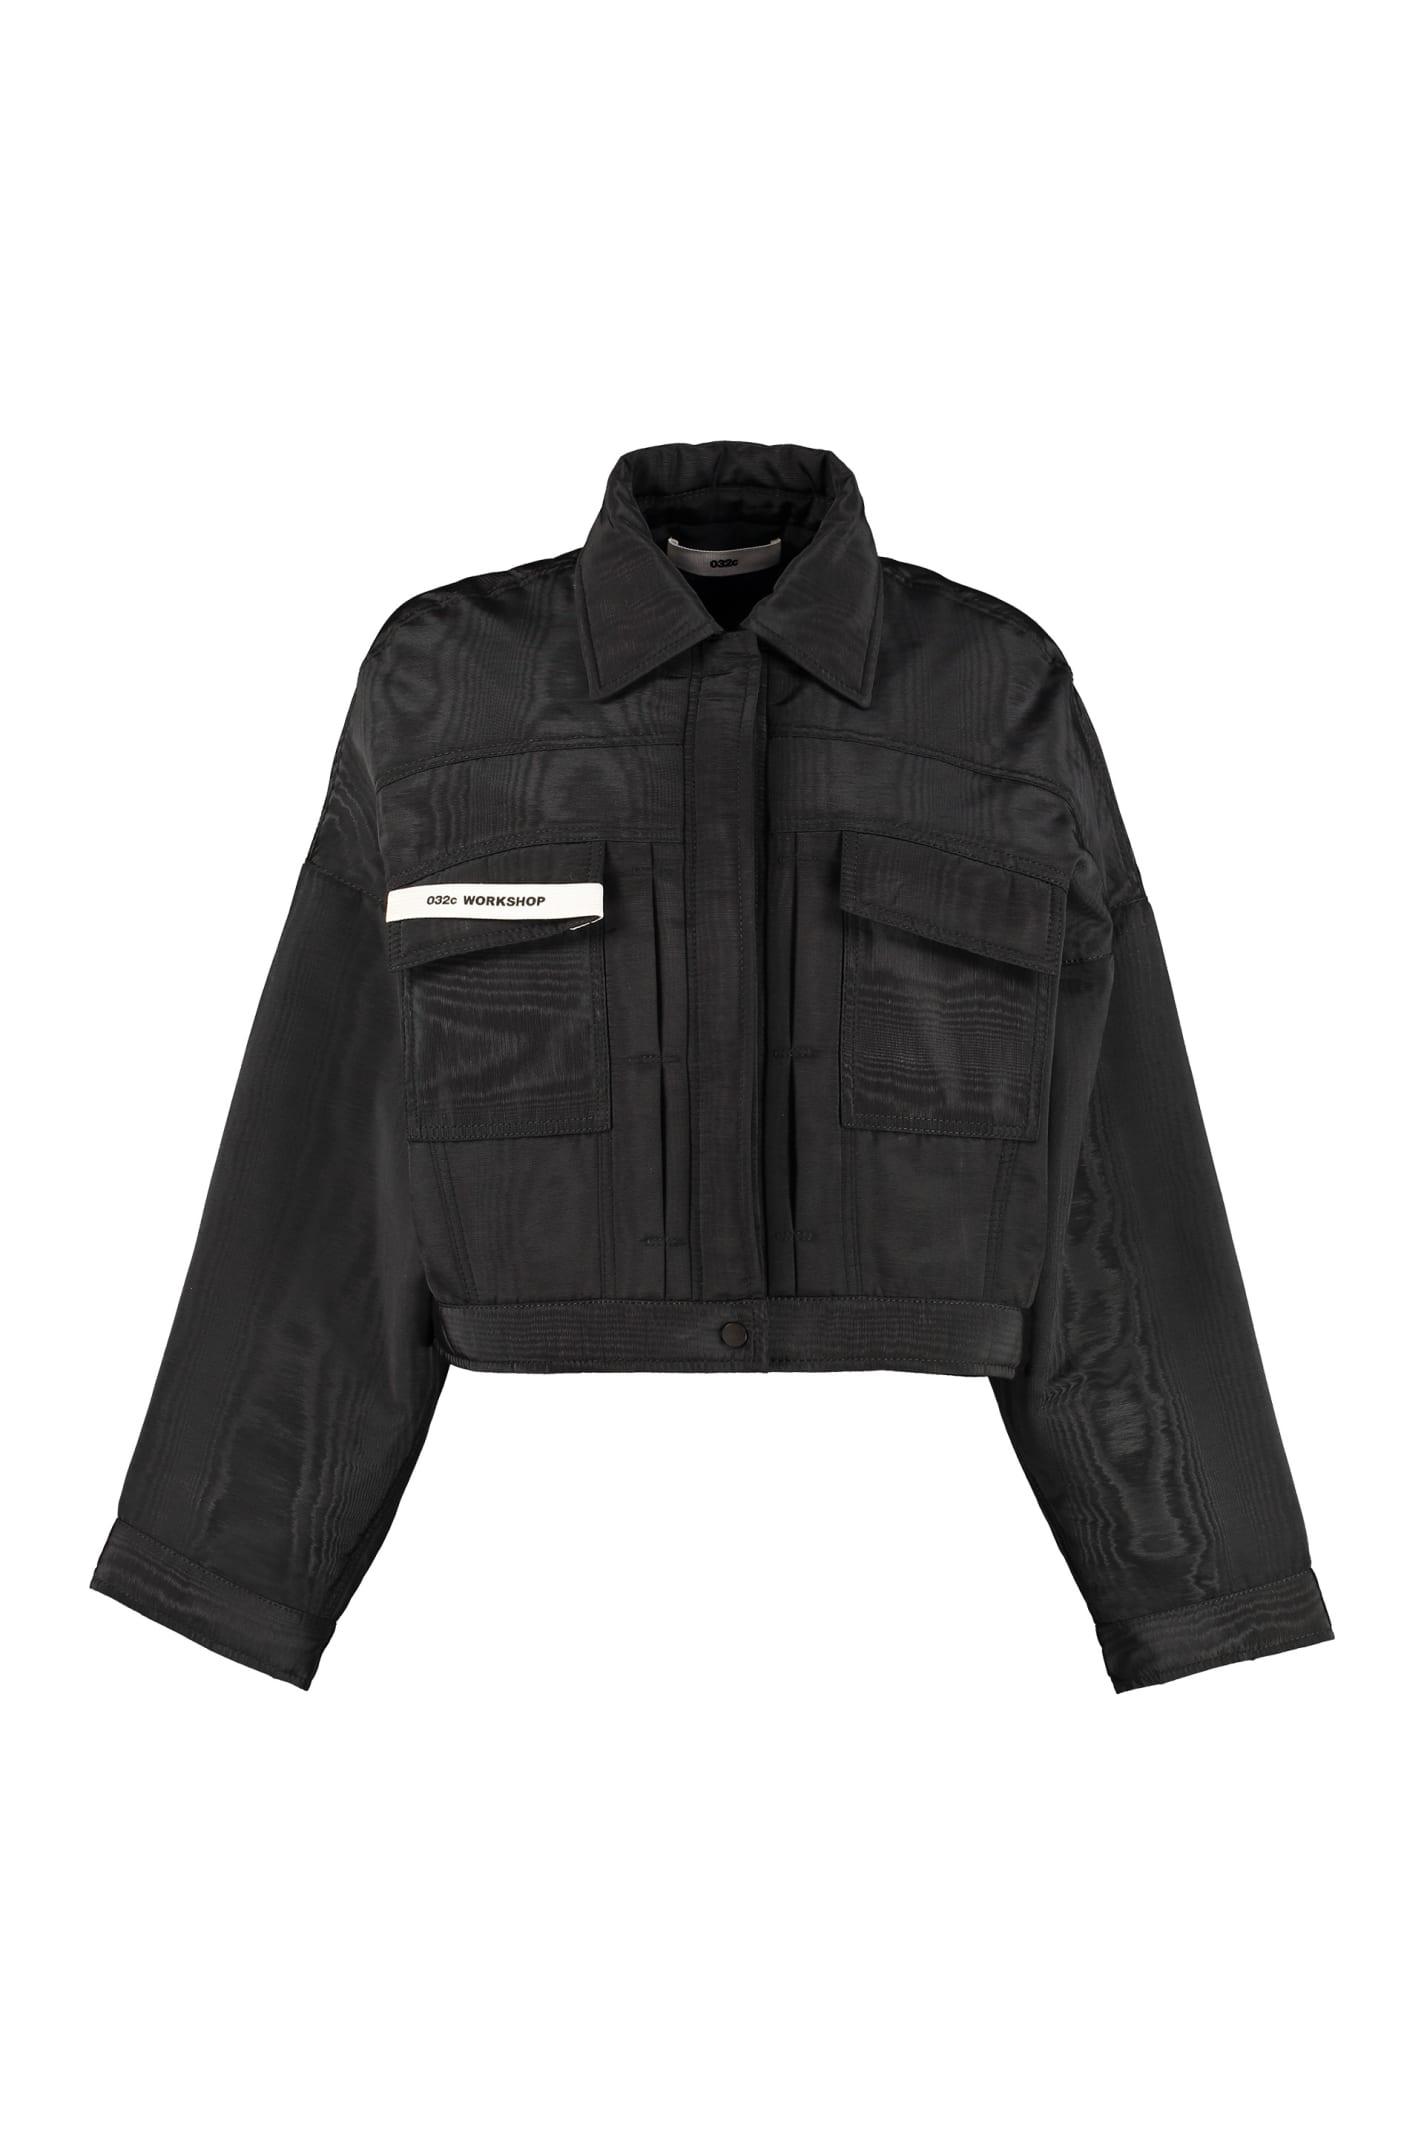 032c Techno Fabric Jacket